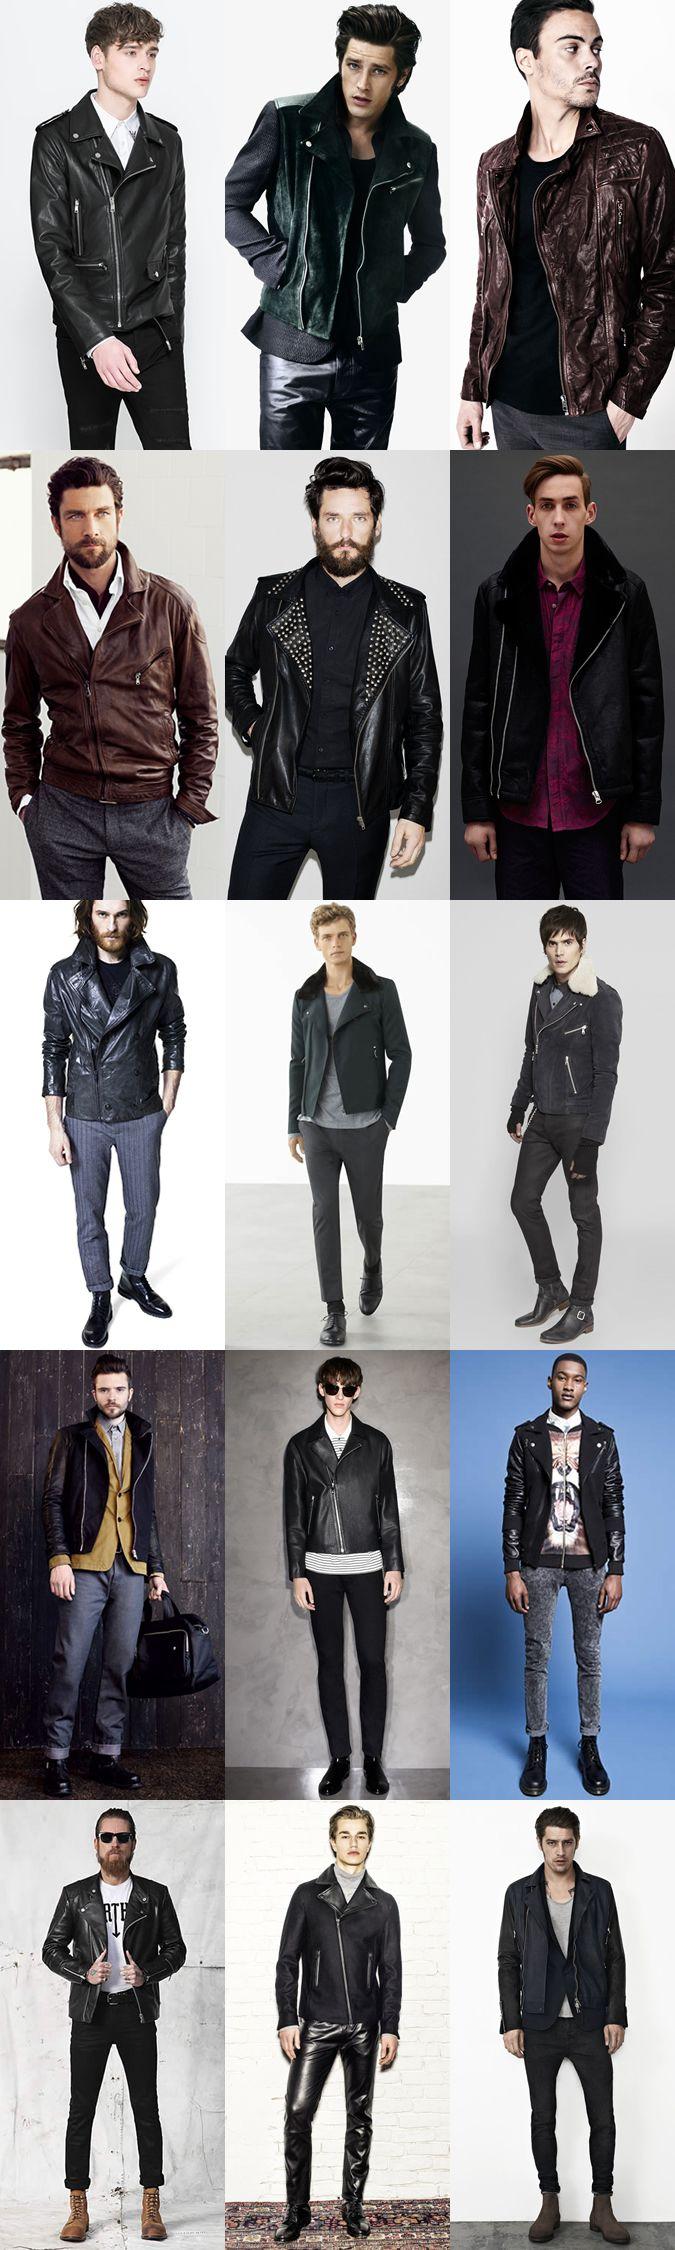 d27a497d99f15 The Biker Jacket, Lookbook Inspiration. Leather Biker Jacket Biker Jacket  Outfit ...